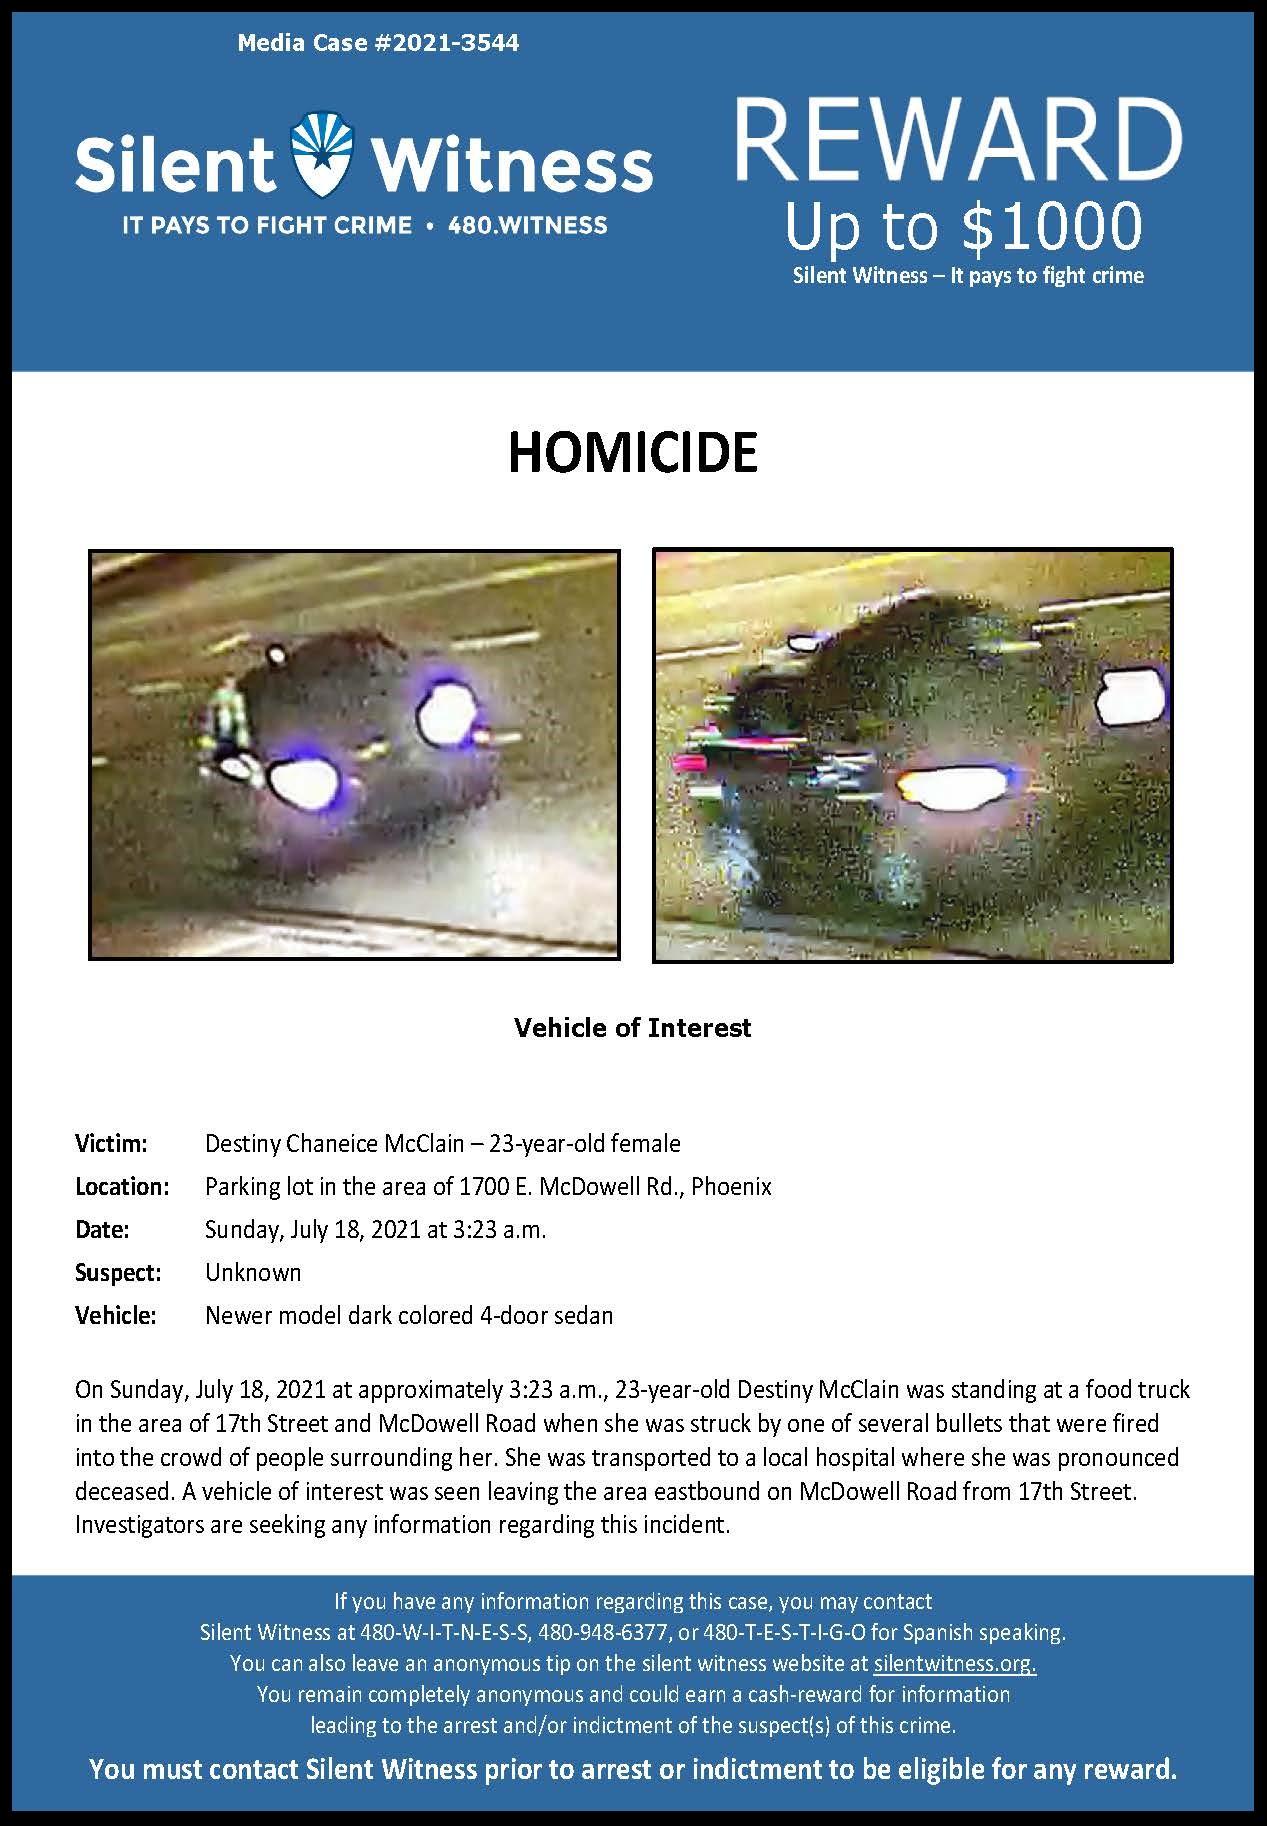 Homicide / Destiny McClain / Area of 1700 E. McDowell Rd., Phoenix